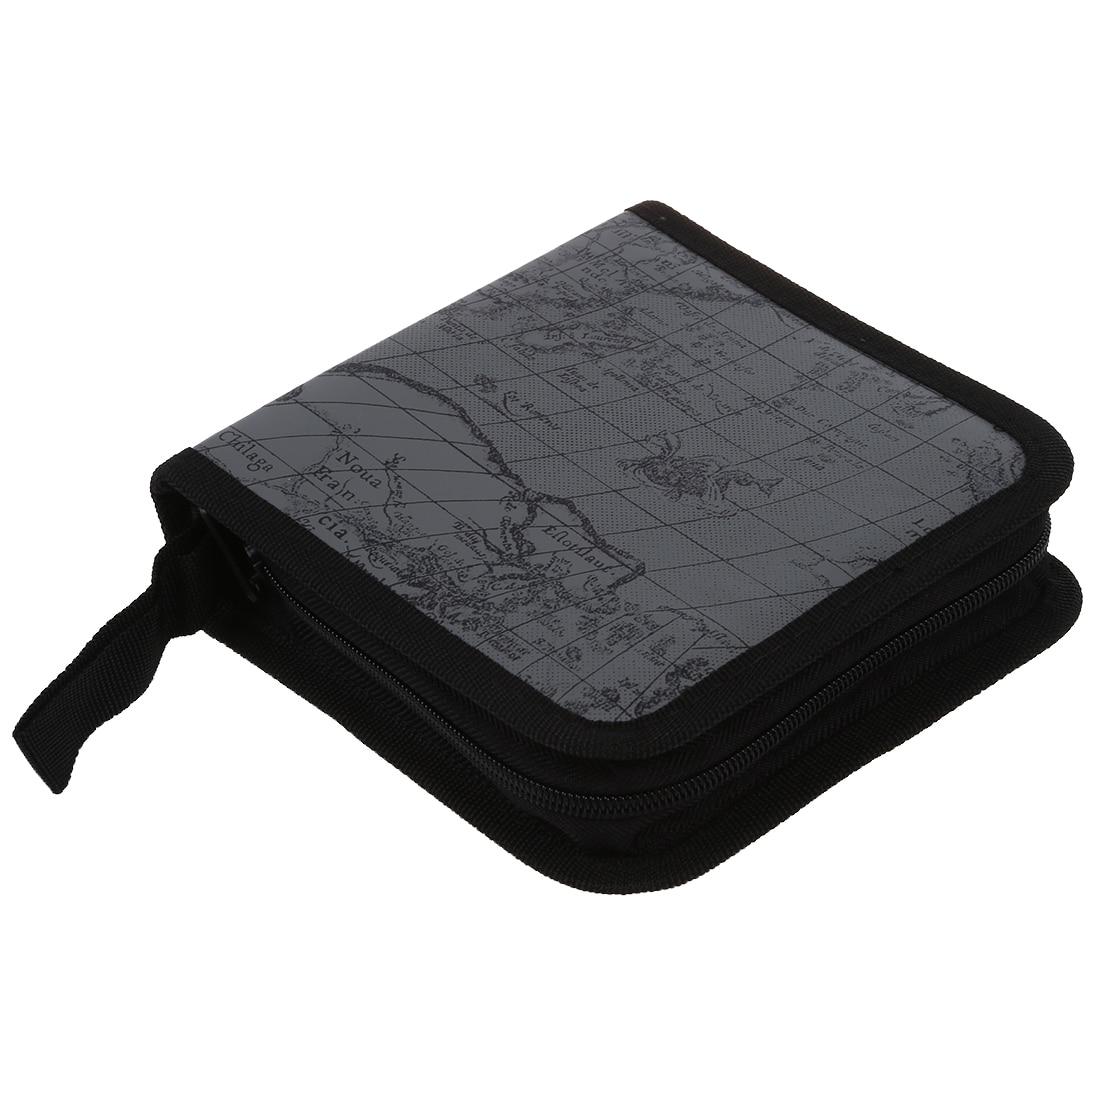 40 Disc Fashion Map CD DVD Storage Holder Sleeve Case Box Wallet Bag Album Zipper - grey